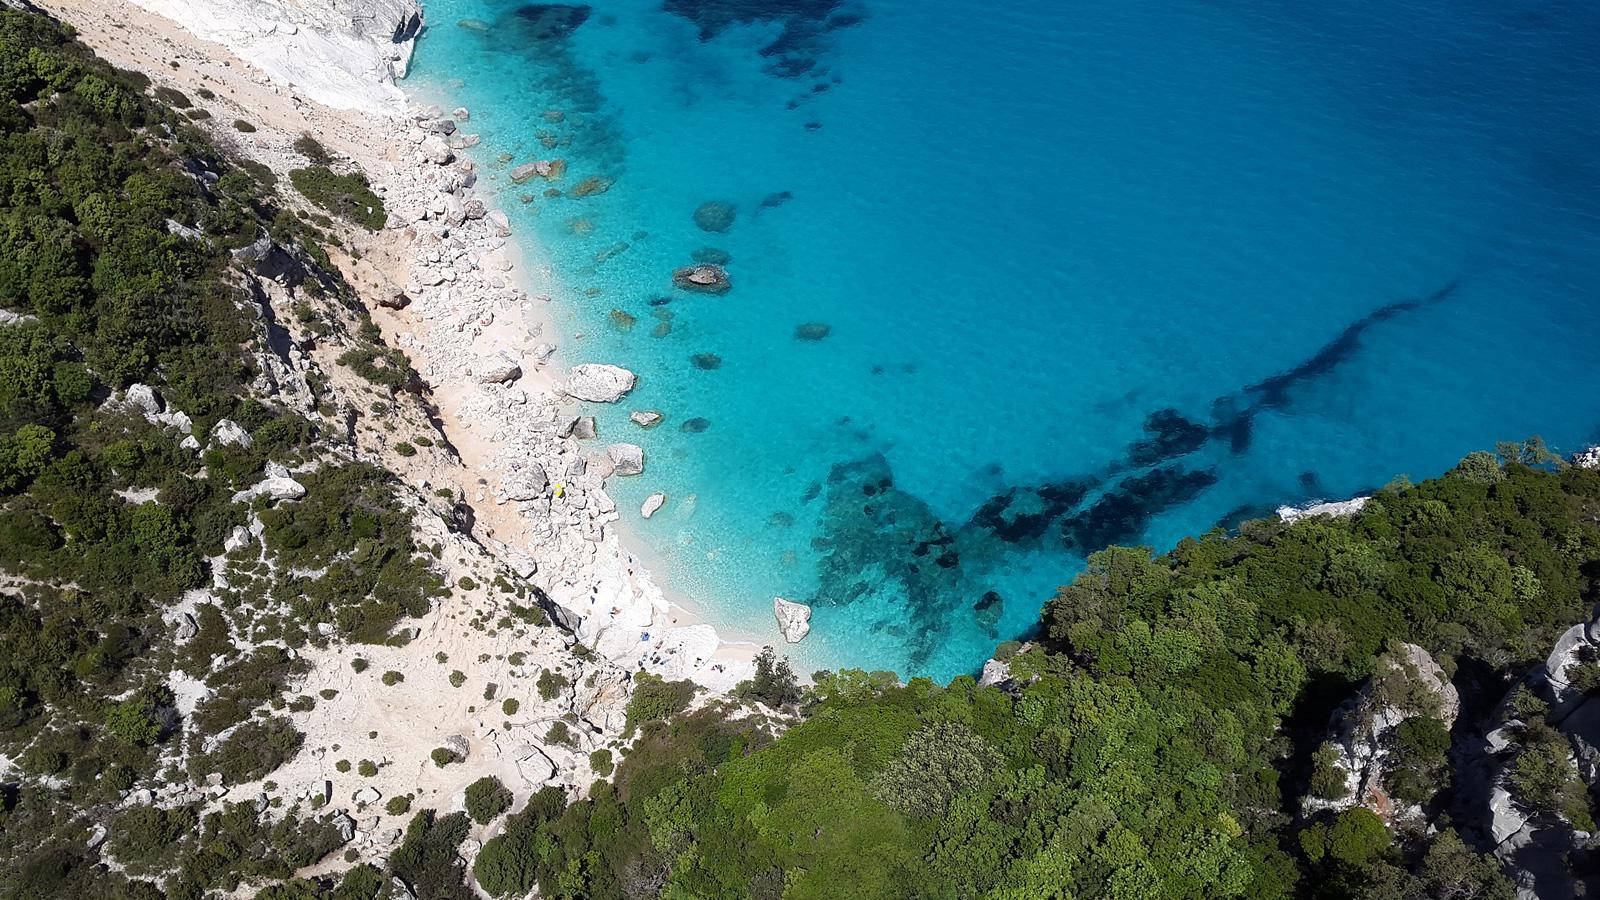 Sardinien & Korsika Abenteuer Segeltörn Segeln Olbia Segelkreuzfahrt traveljunkies